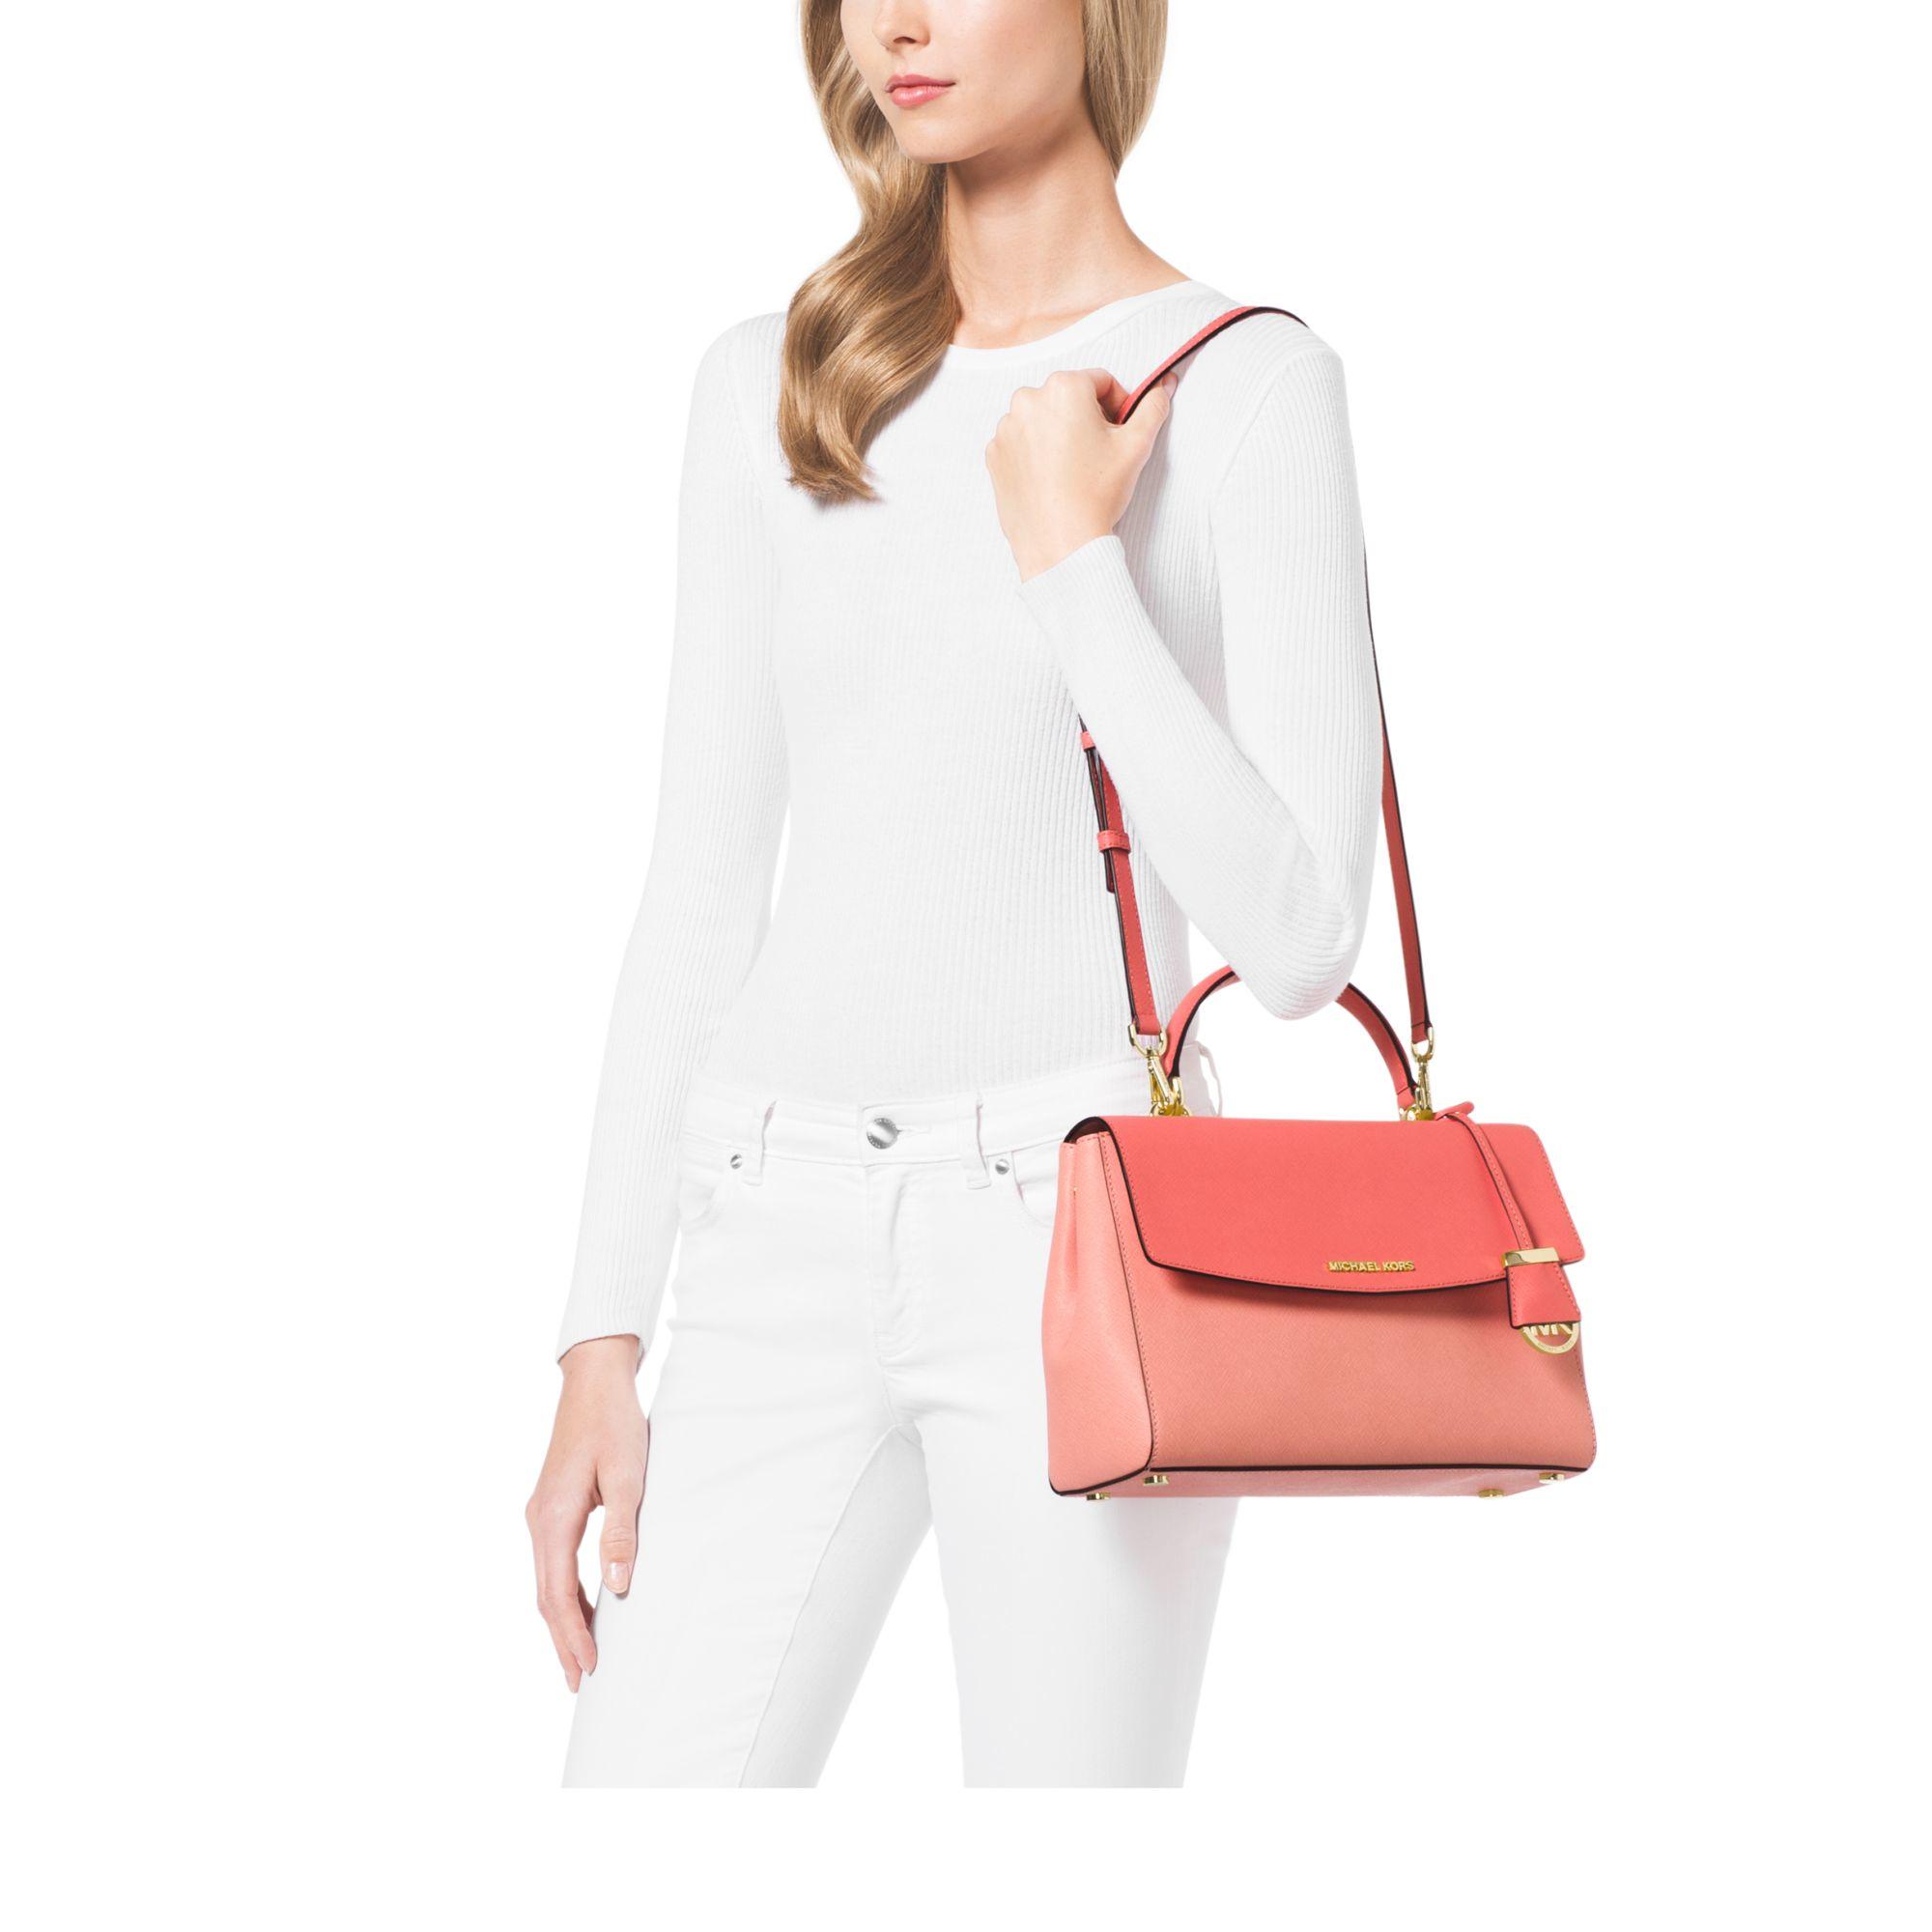 68aca23ddf98 Michael Kors Ava Medium Color-block Saffiano Leather Satchel - Lyst